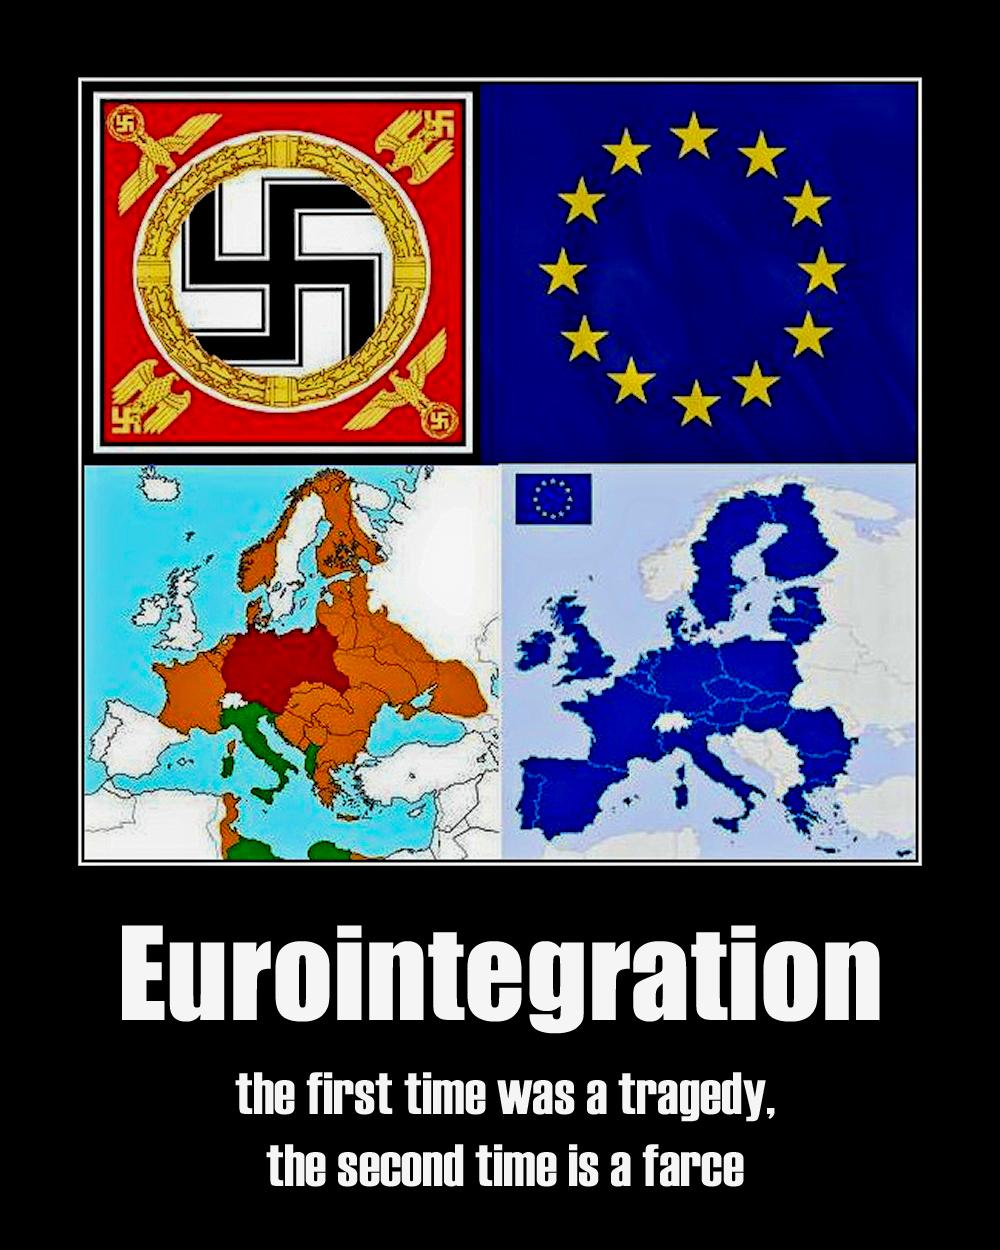 00 Eurointegration. 30.04.14